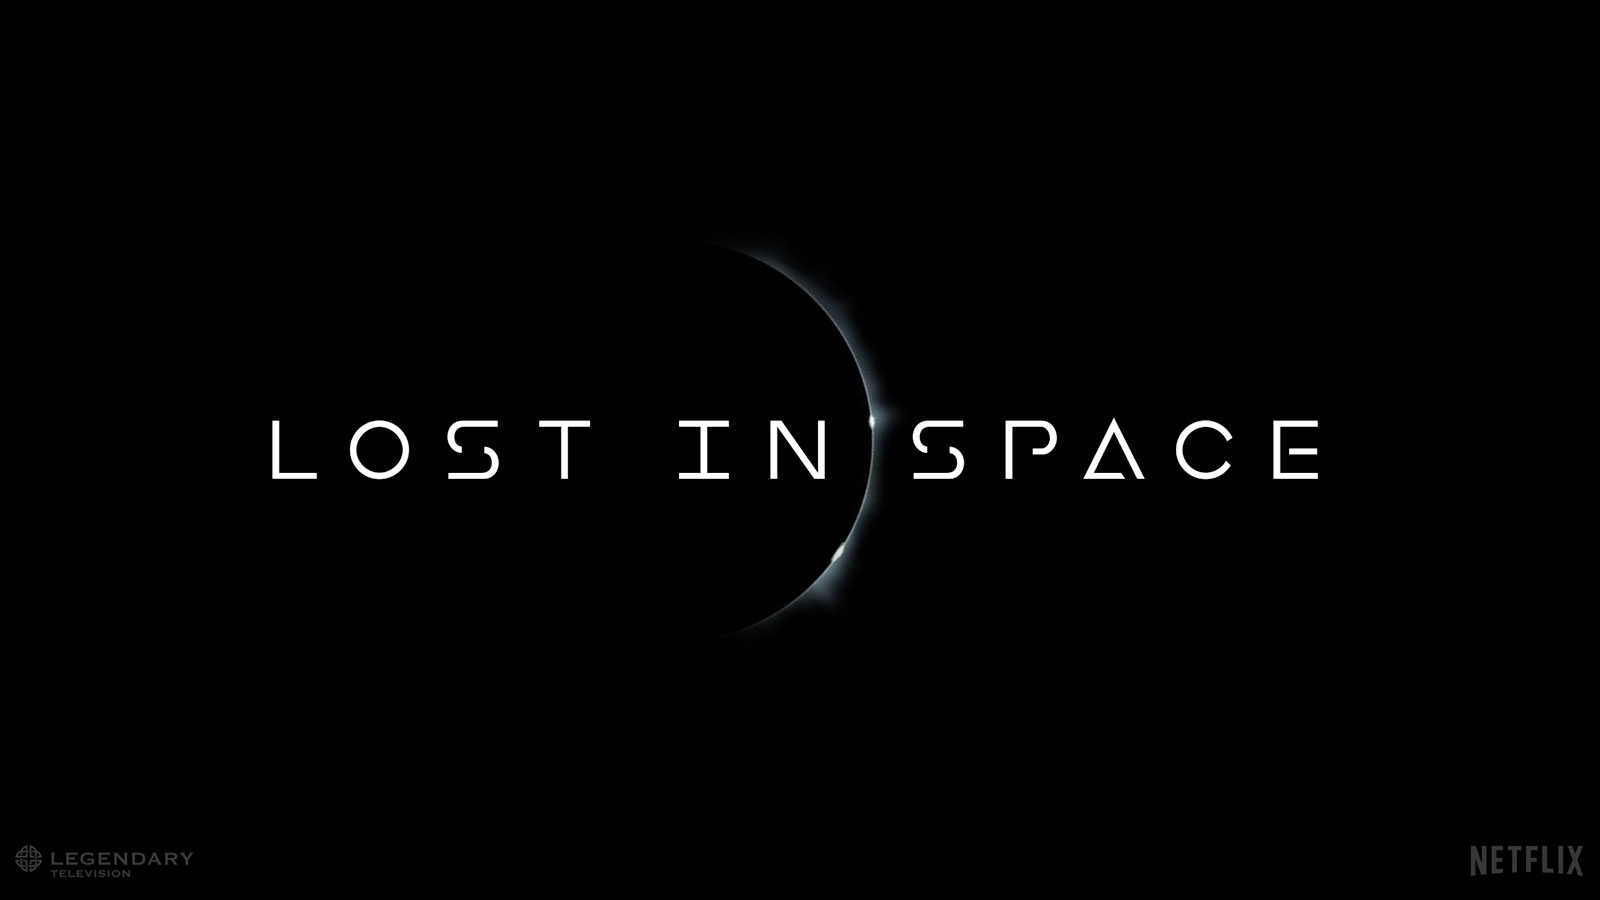 tv_lostinspace_featureimage_desktop_1600x900